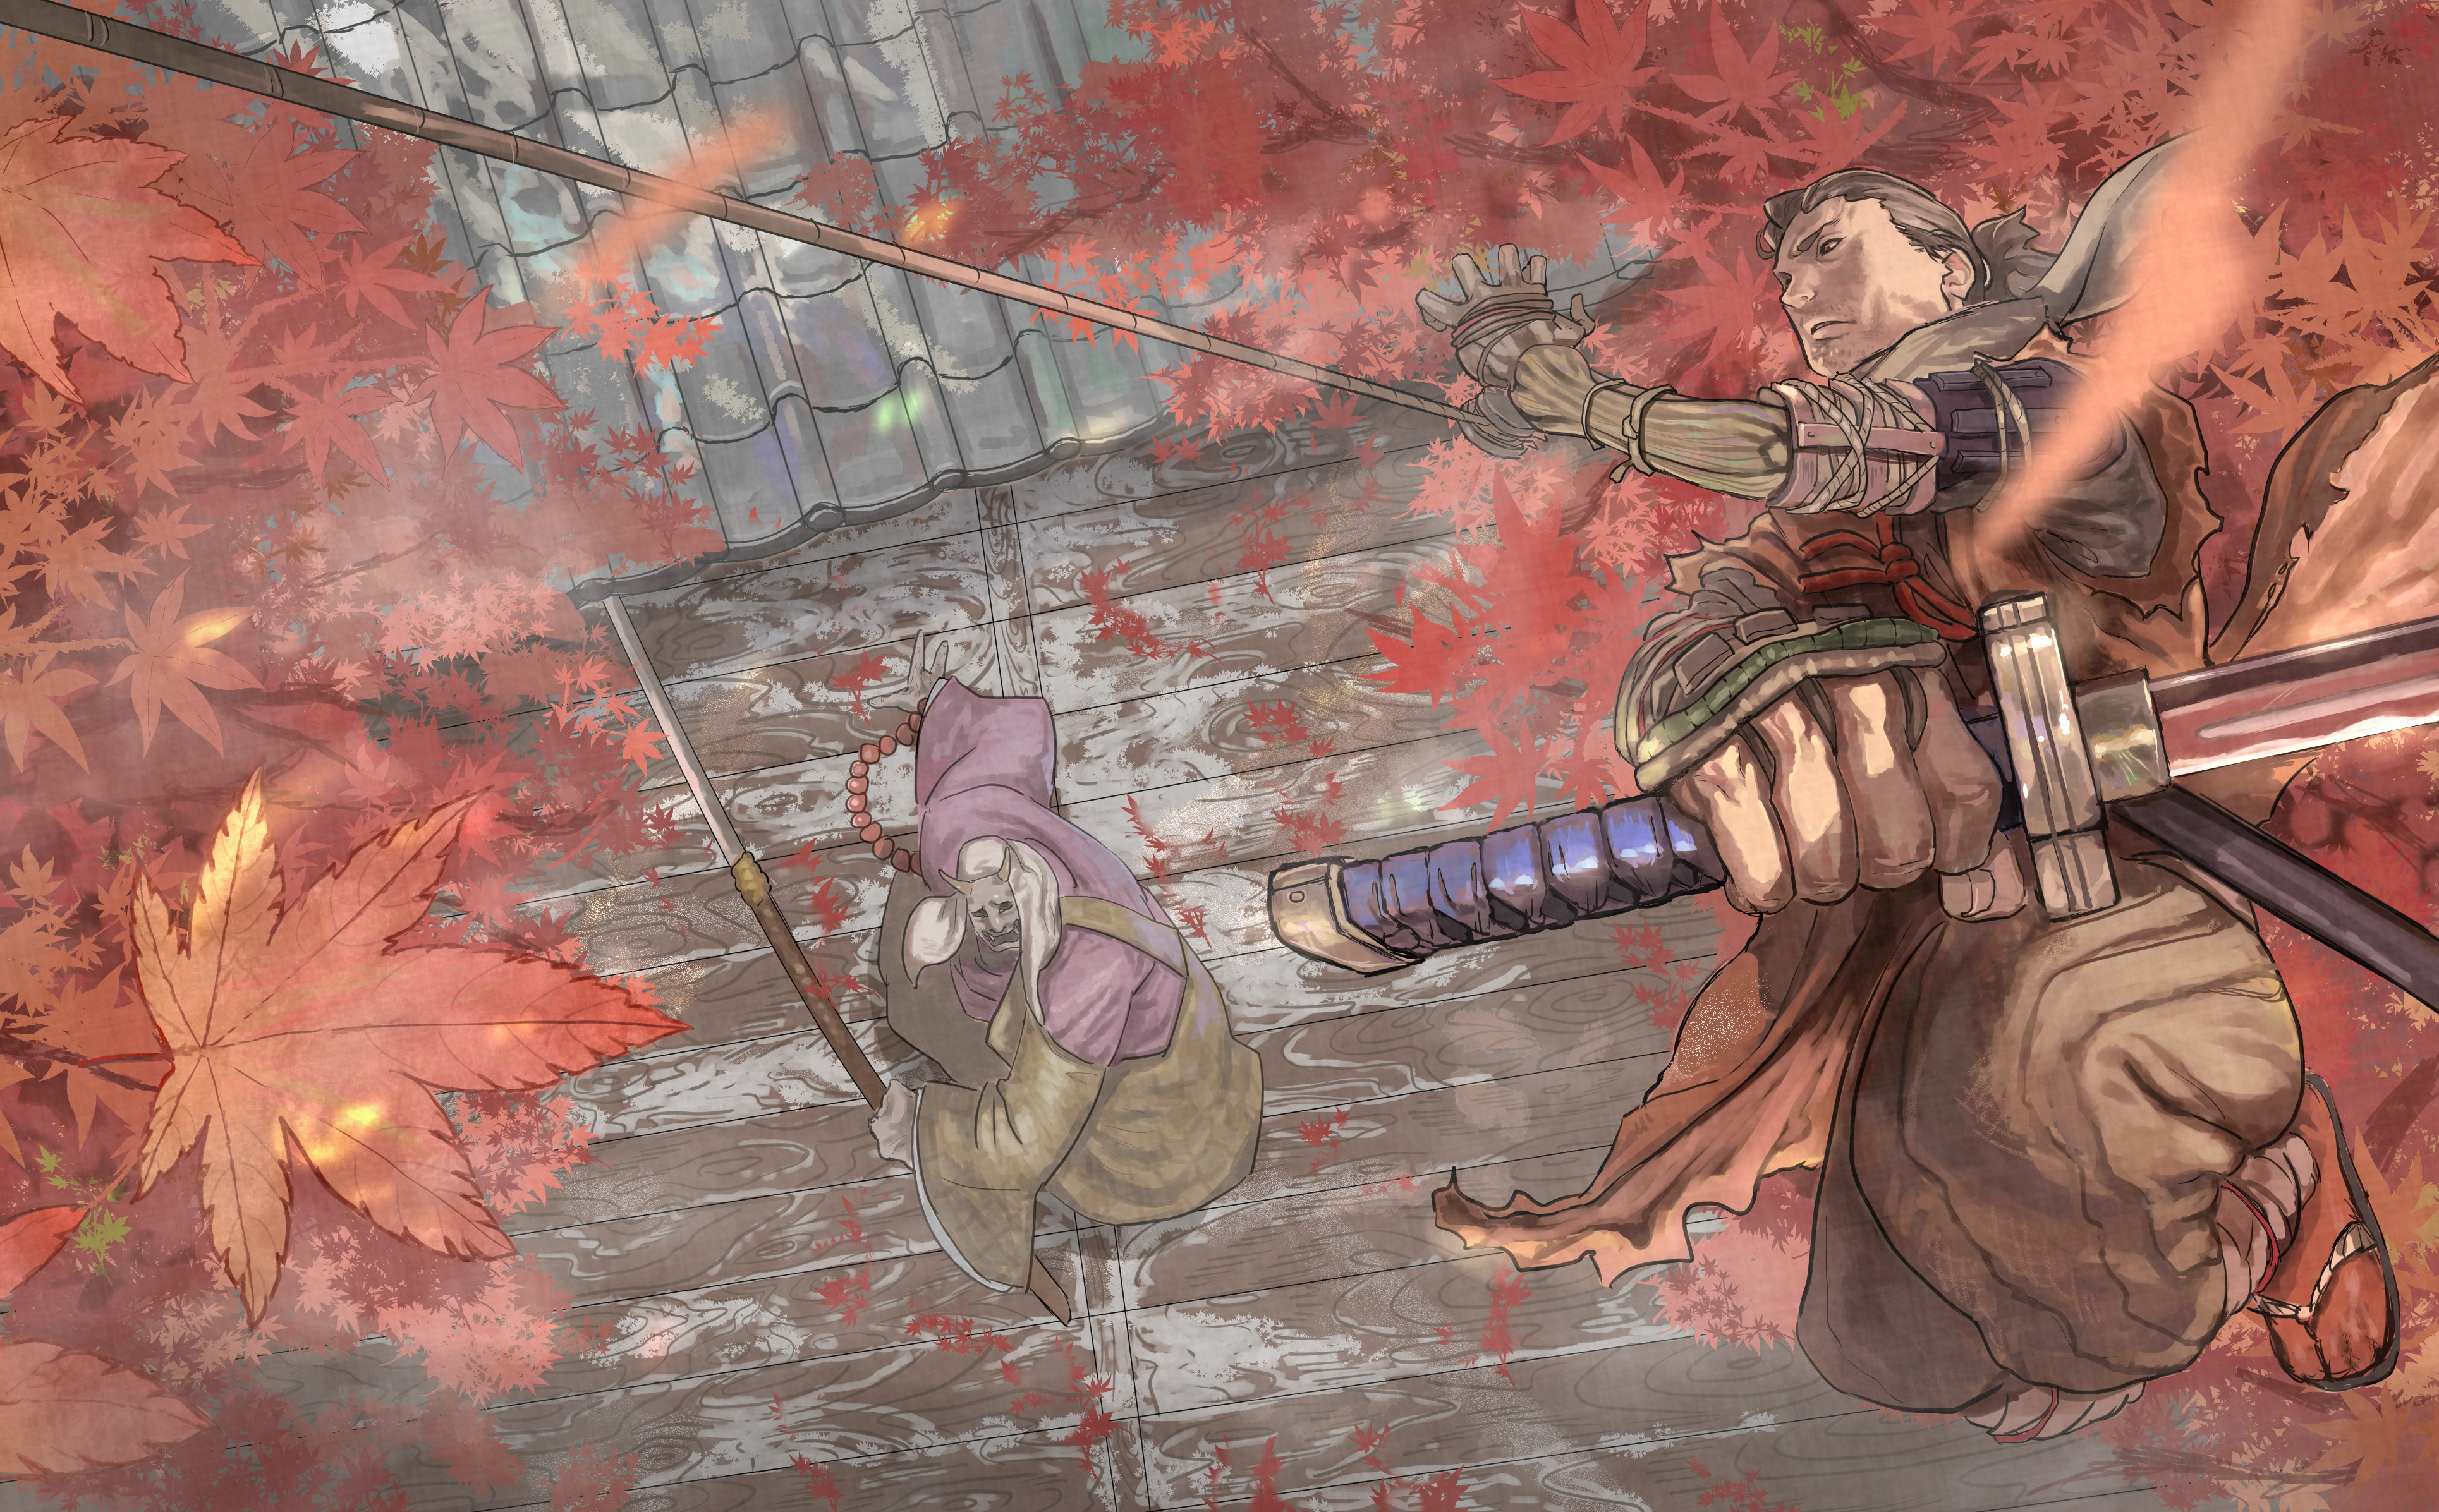 Sekiro Shadows Die Twice 4k Ultra Hd Wallpaper Background Image